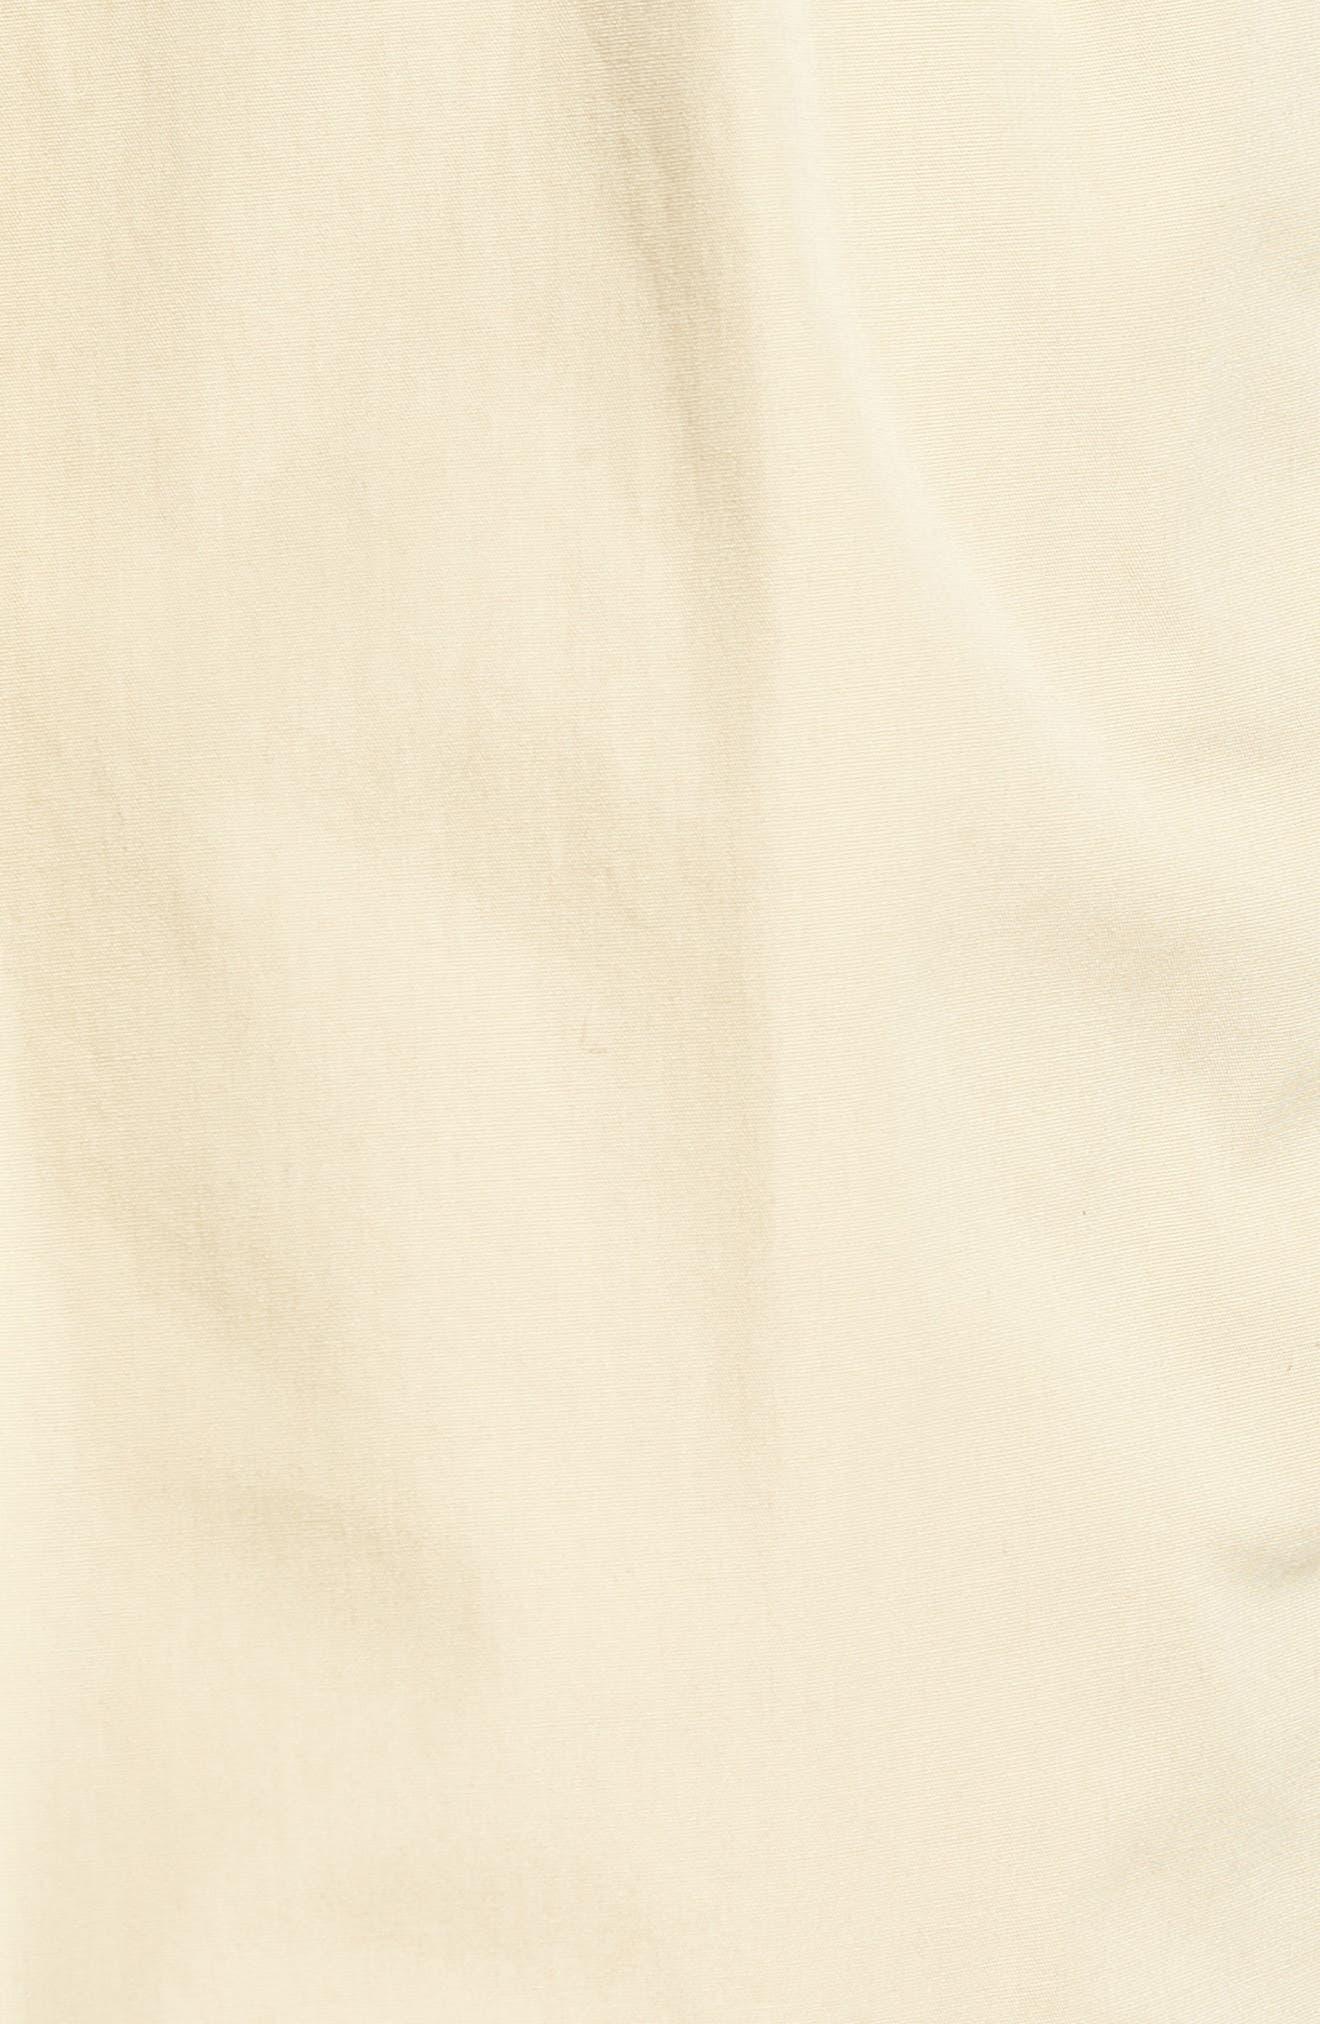 M2 Classic Fit Pleated Tropical Cotton Poplin Shorts,                             Alternate thumbnail 5, color,                             Khaki